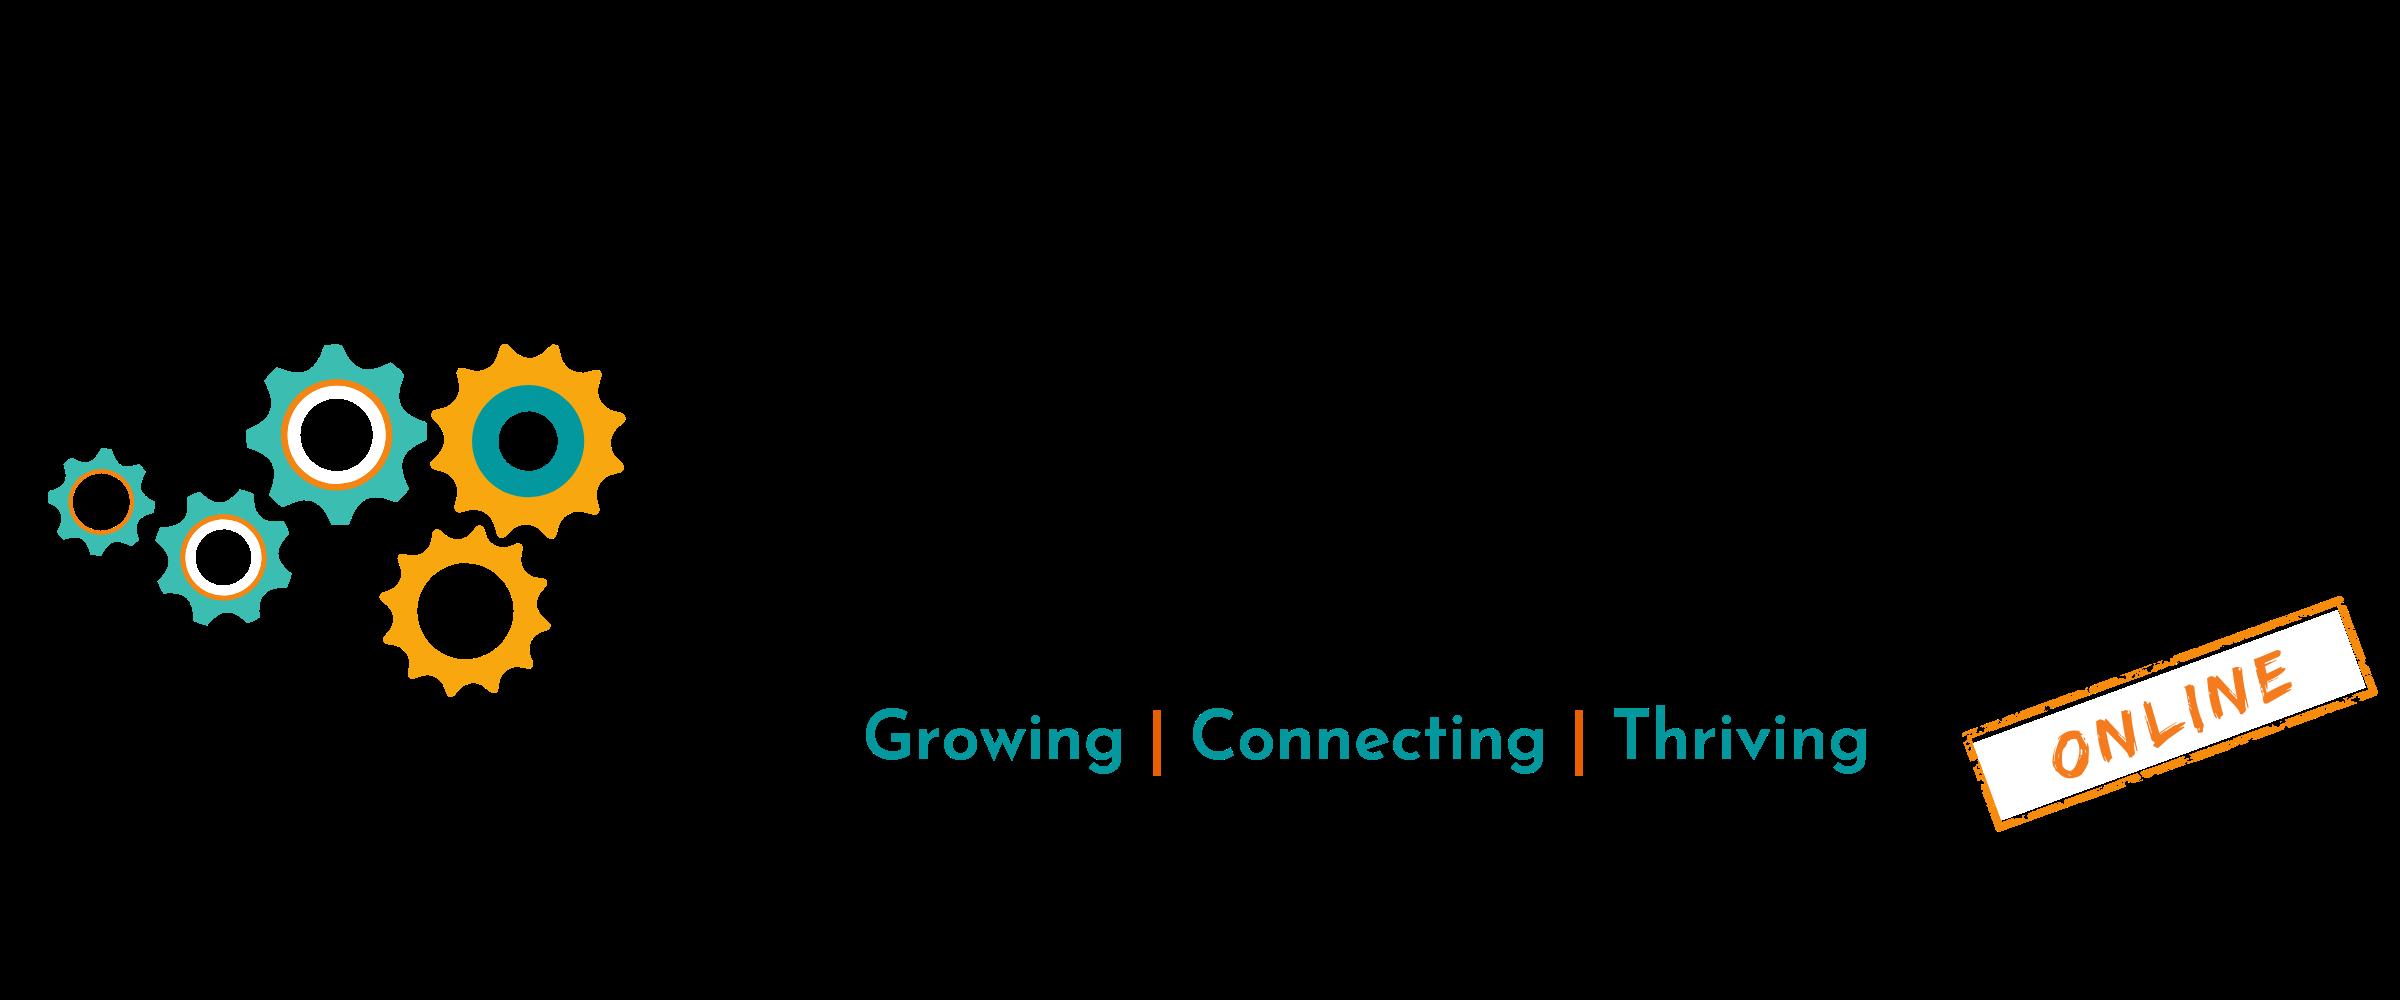 LifeStreams Logo